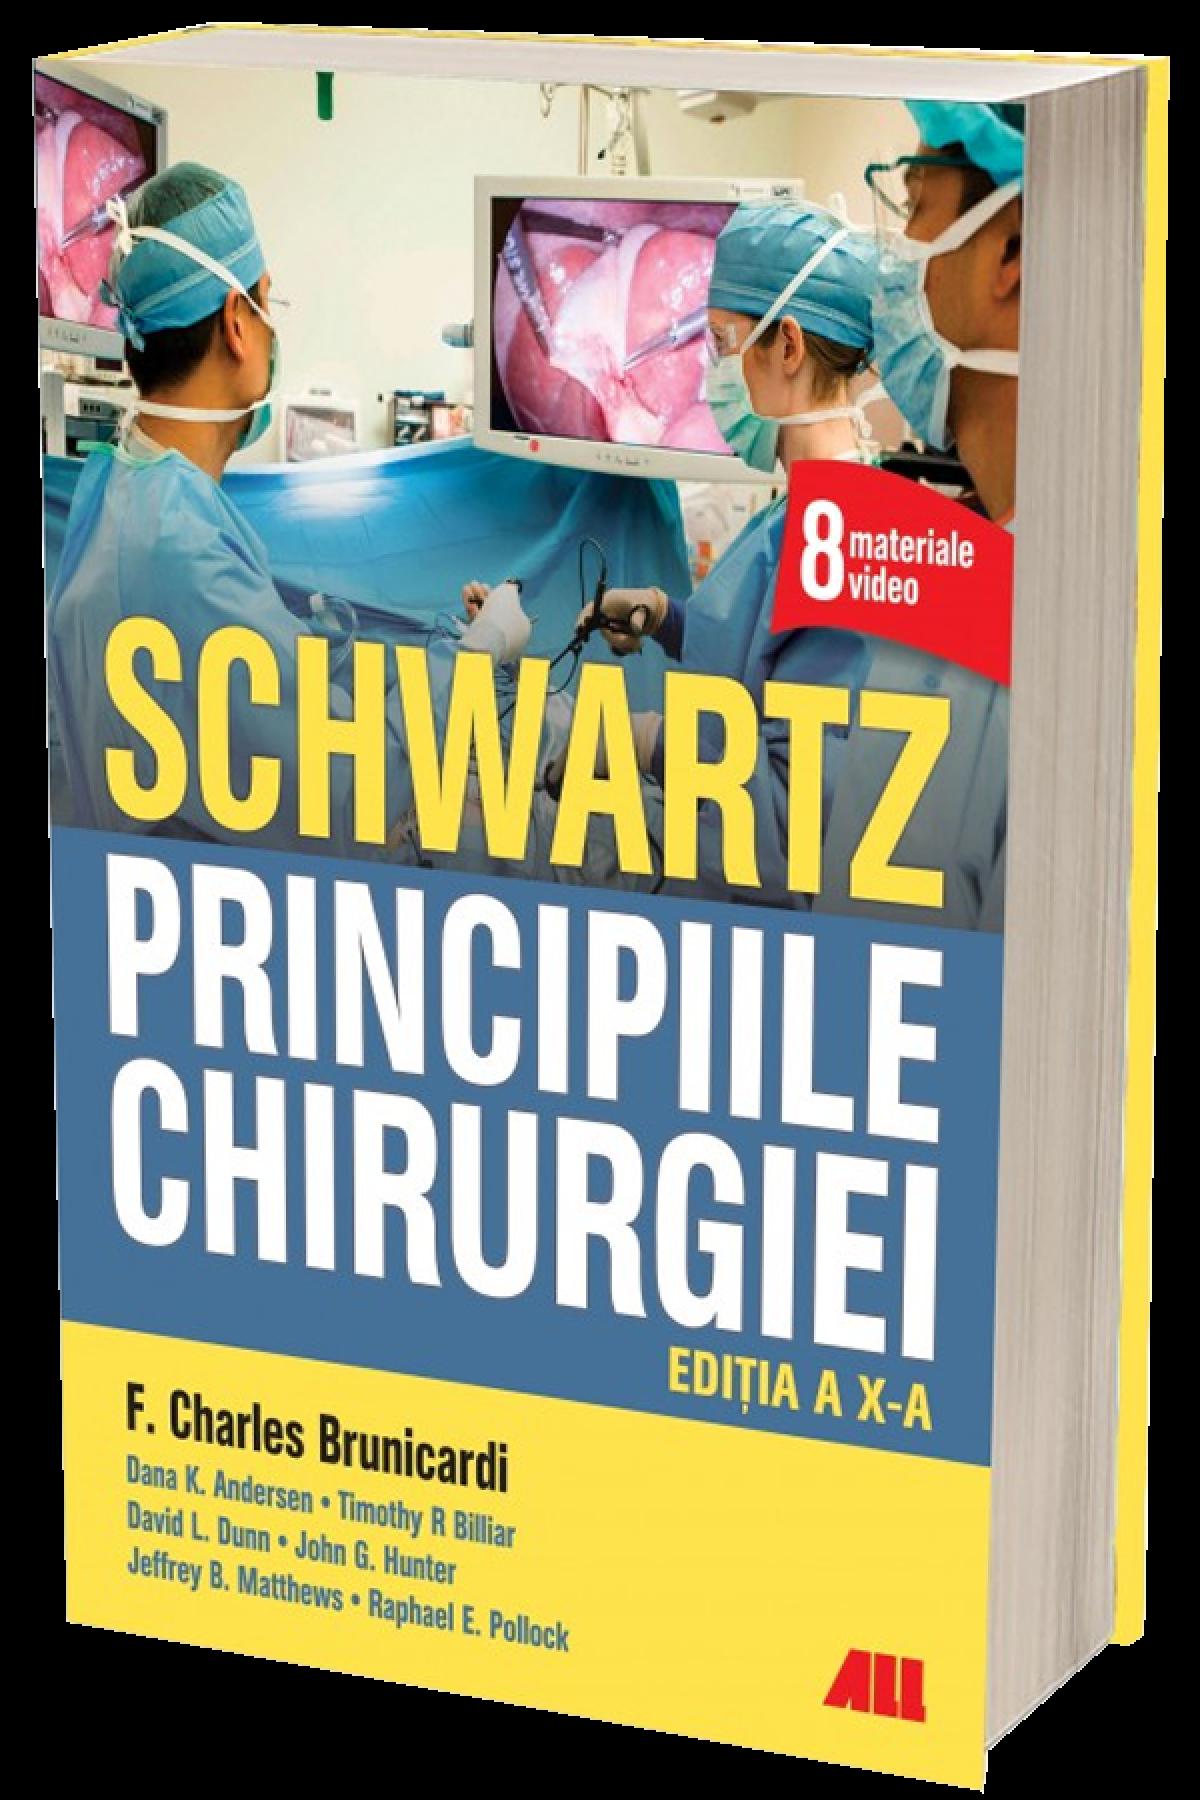 SCHWARTZ. Principiile chirurgiei